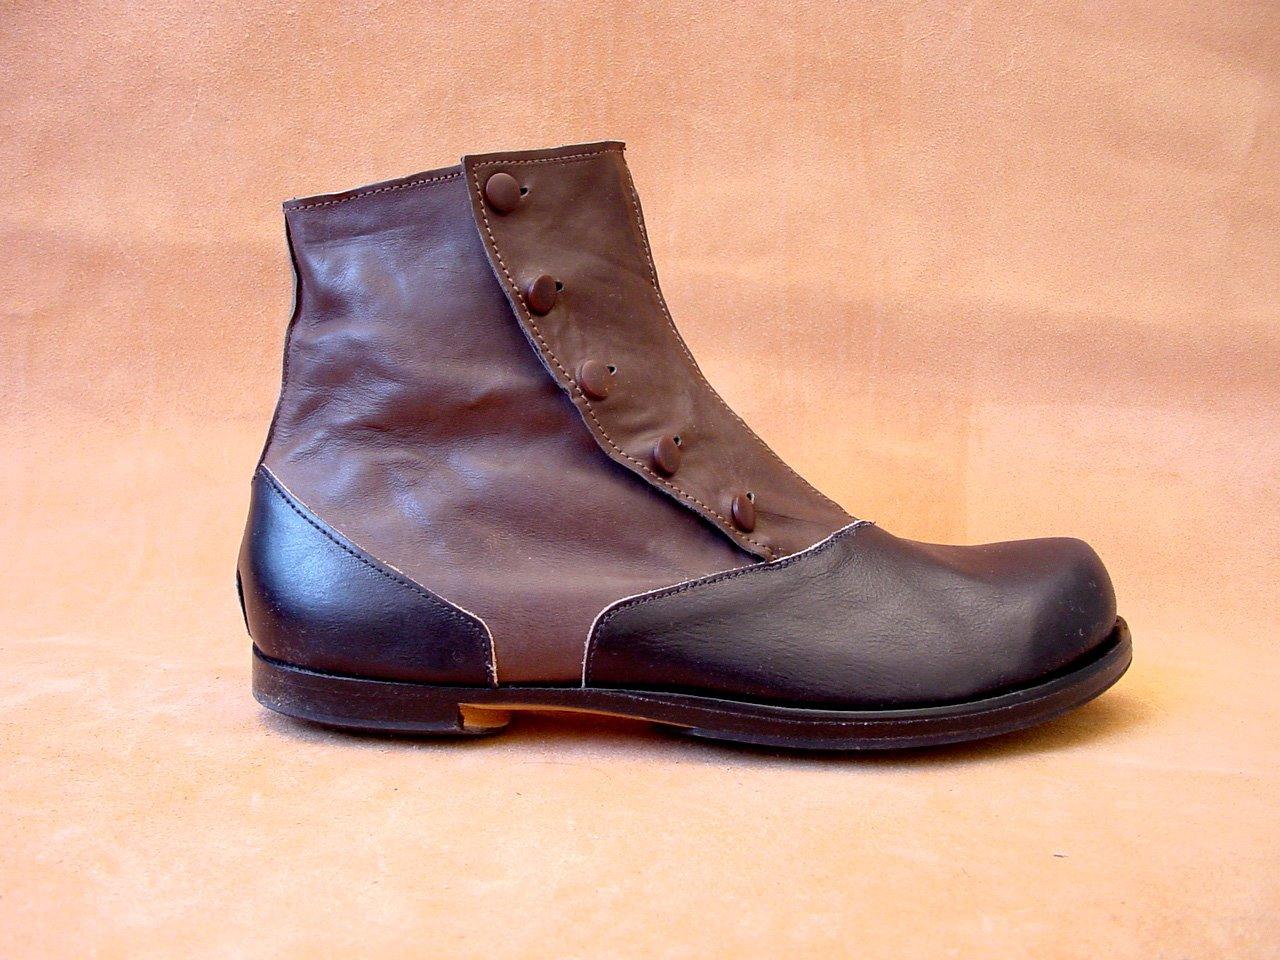 6cbcfc53c8423 Cydwoq shoes